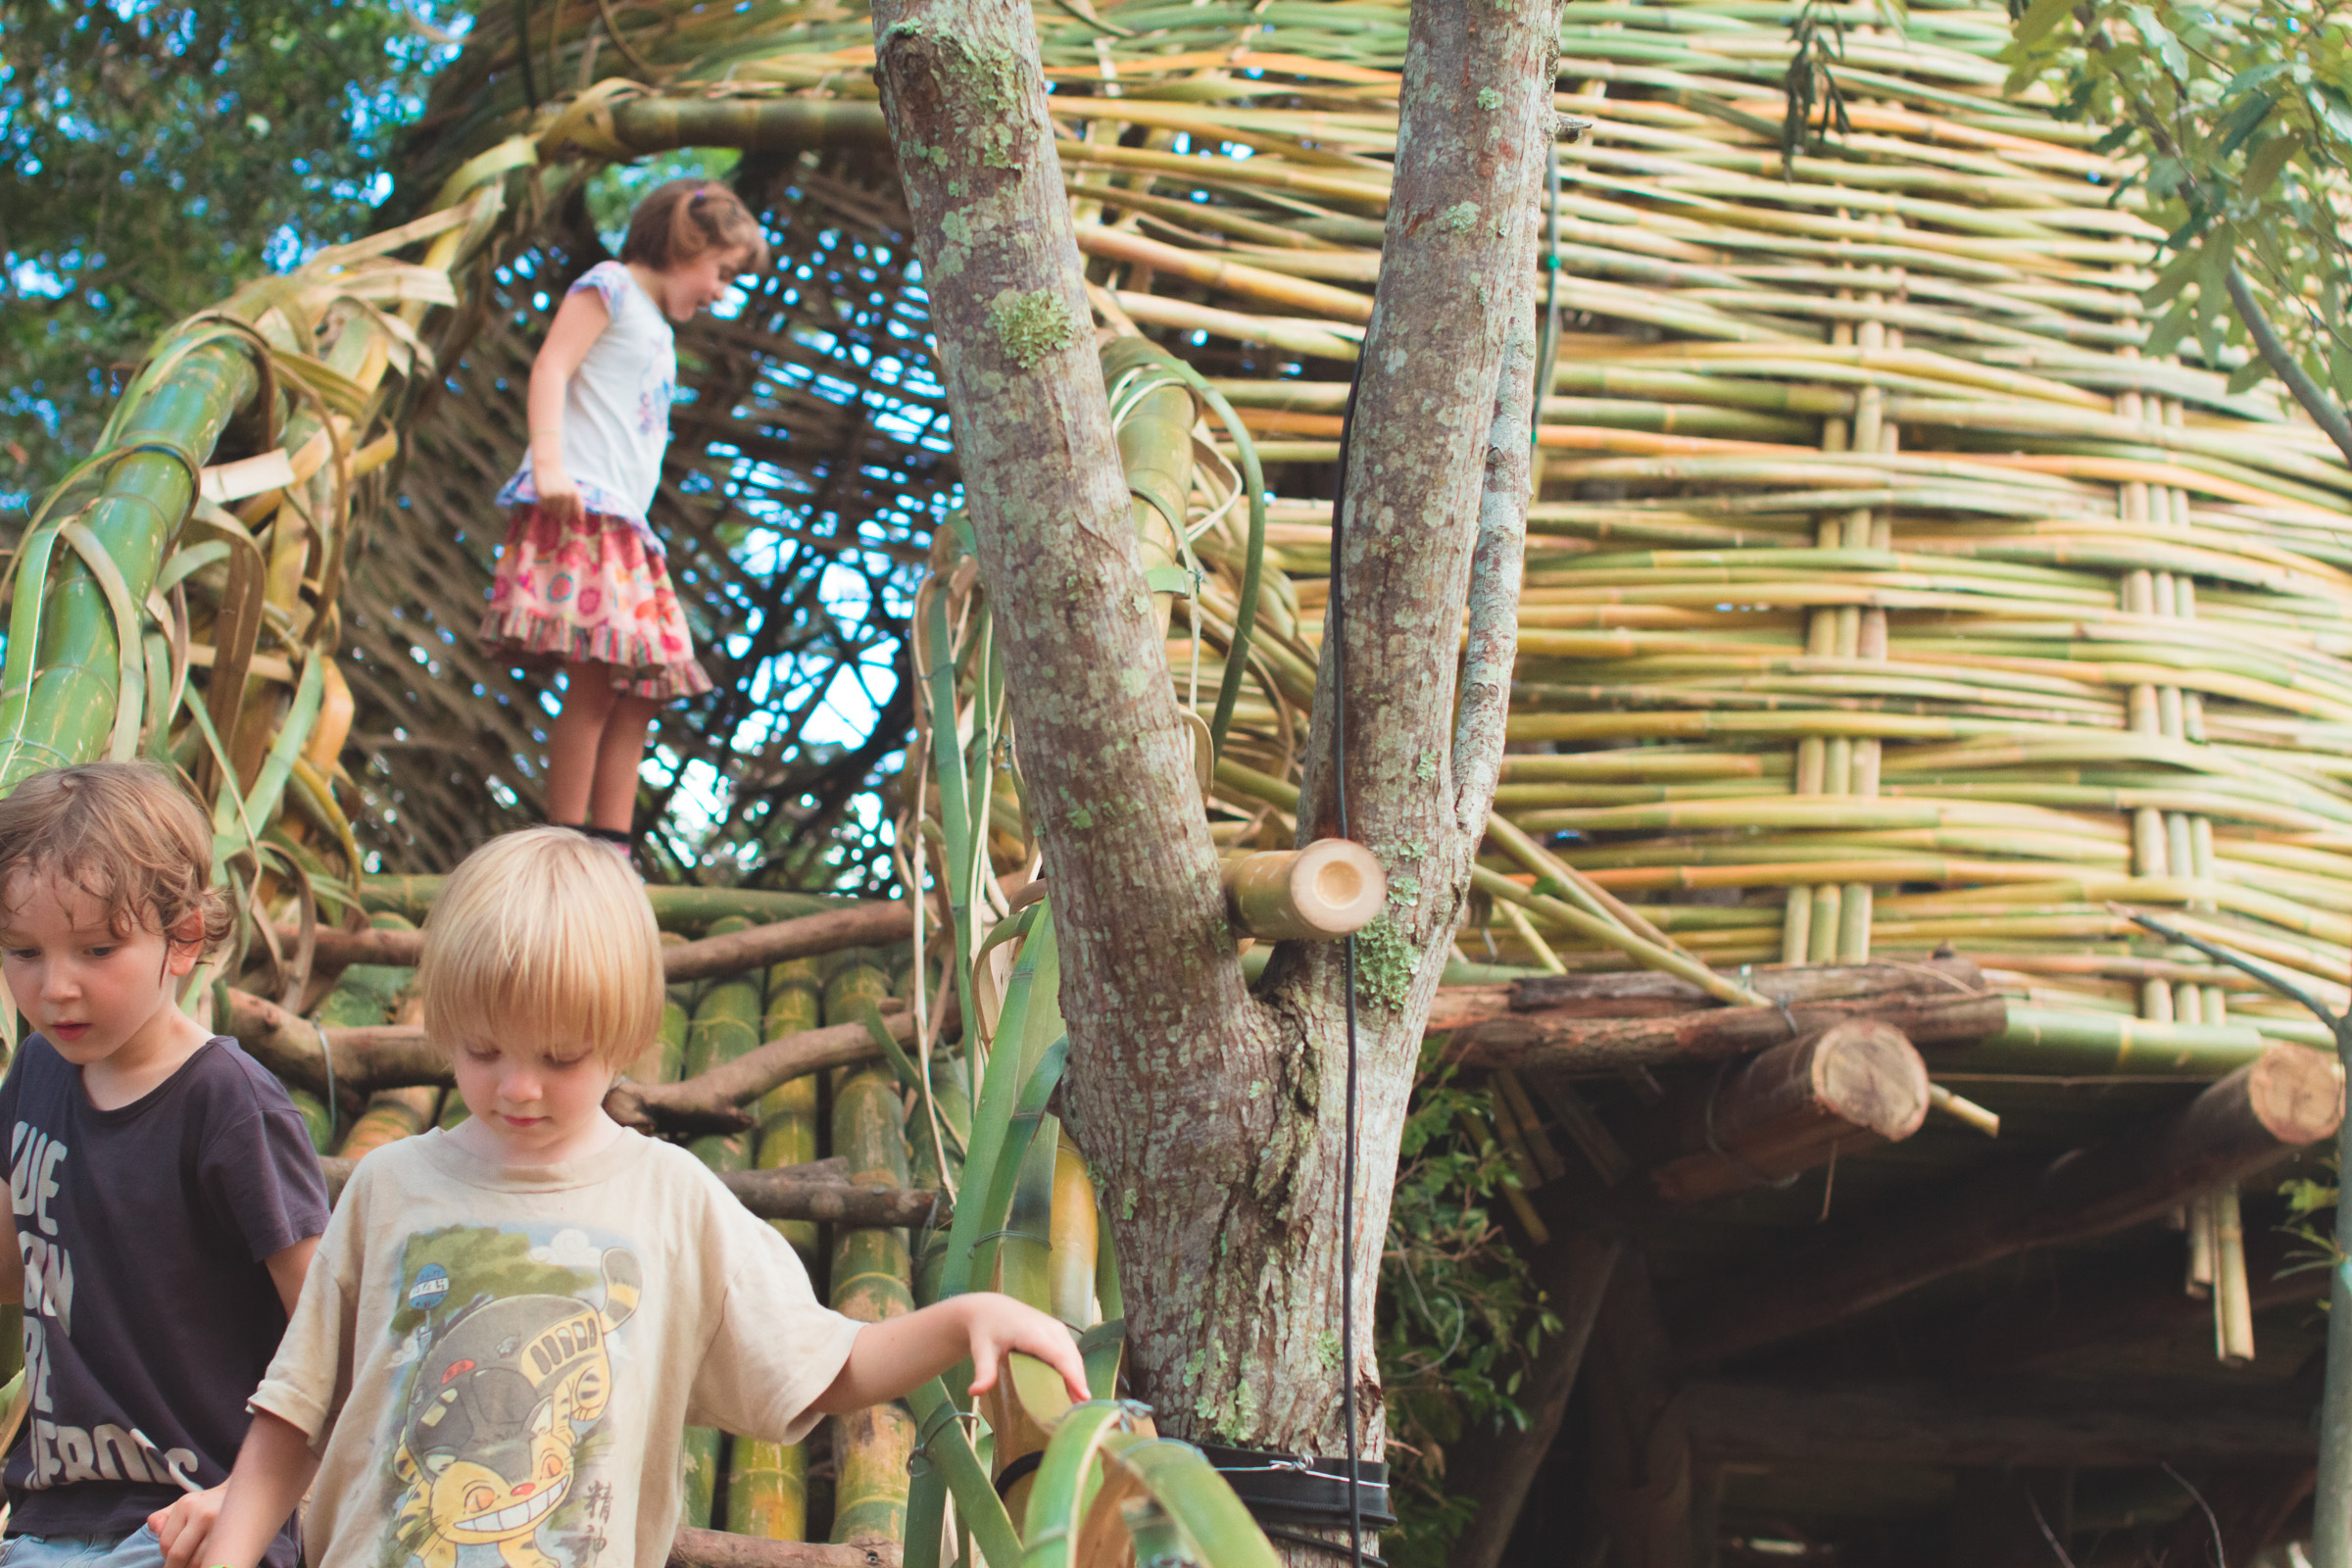 Tree house photography by Mercurio Alvarado  (130 of 132).jpg